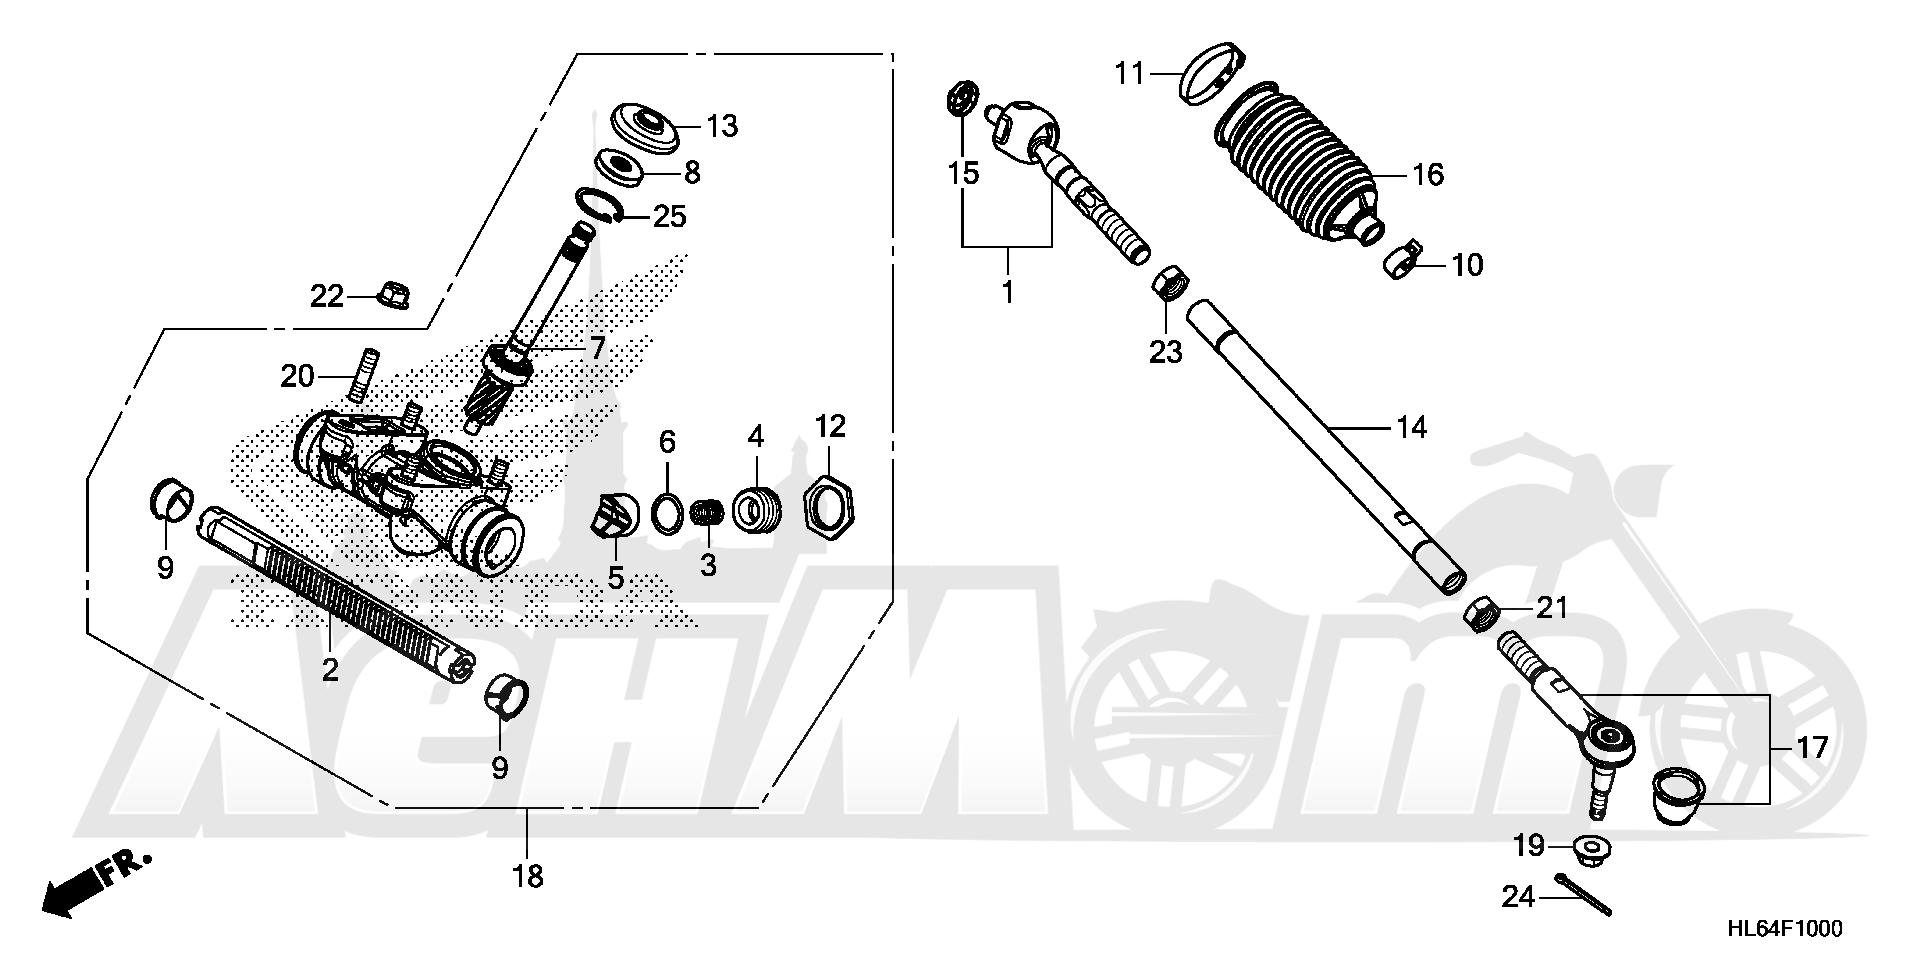 Запчасти для Квадроцикла Honda 2019 SXS1000S2R Раздел: STEERING GEAR BOX AND TIE ROD | рулевое управление коробка передач и рулевая тяга